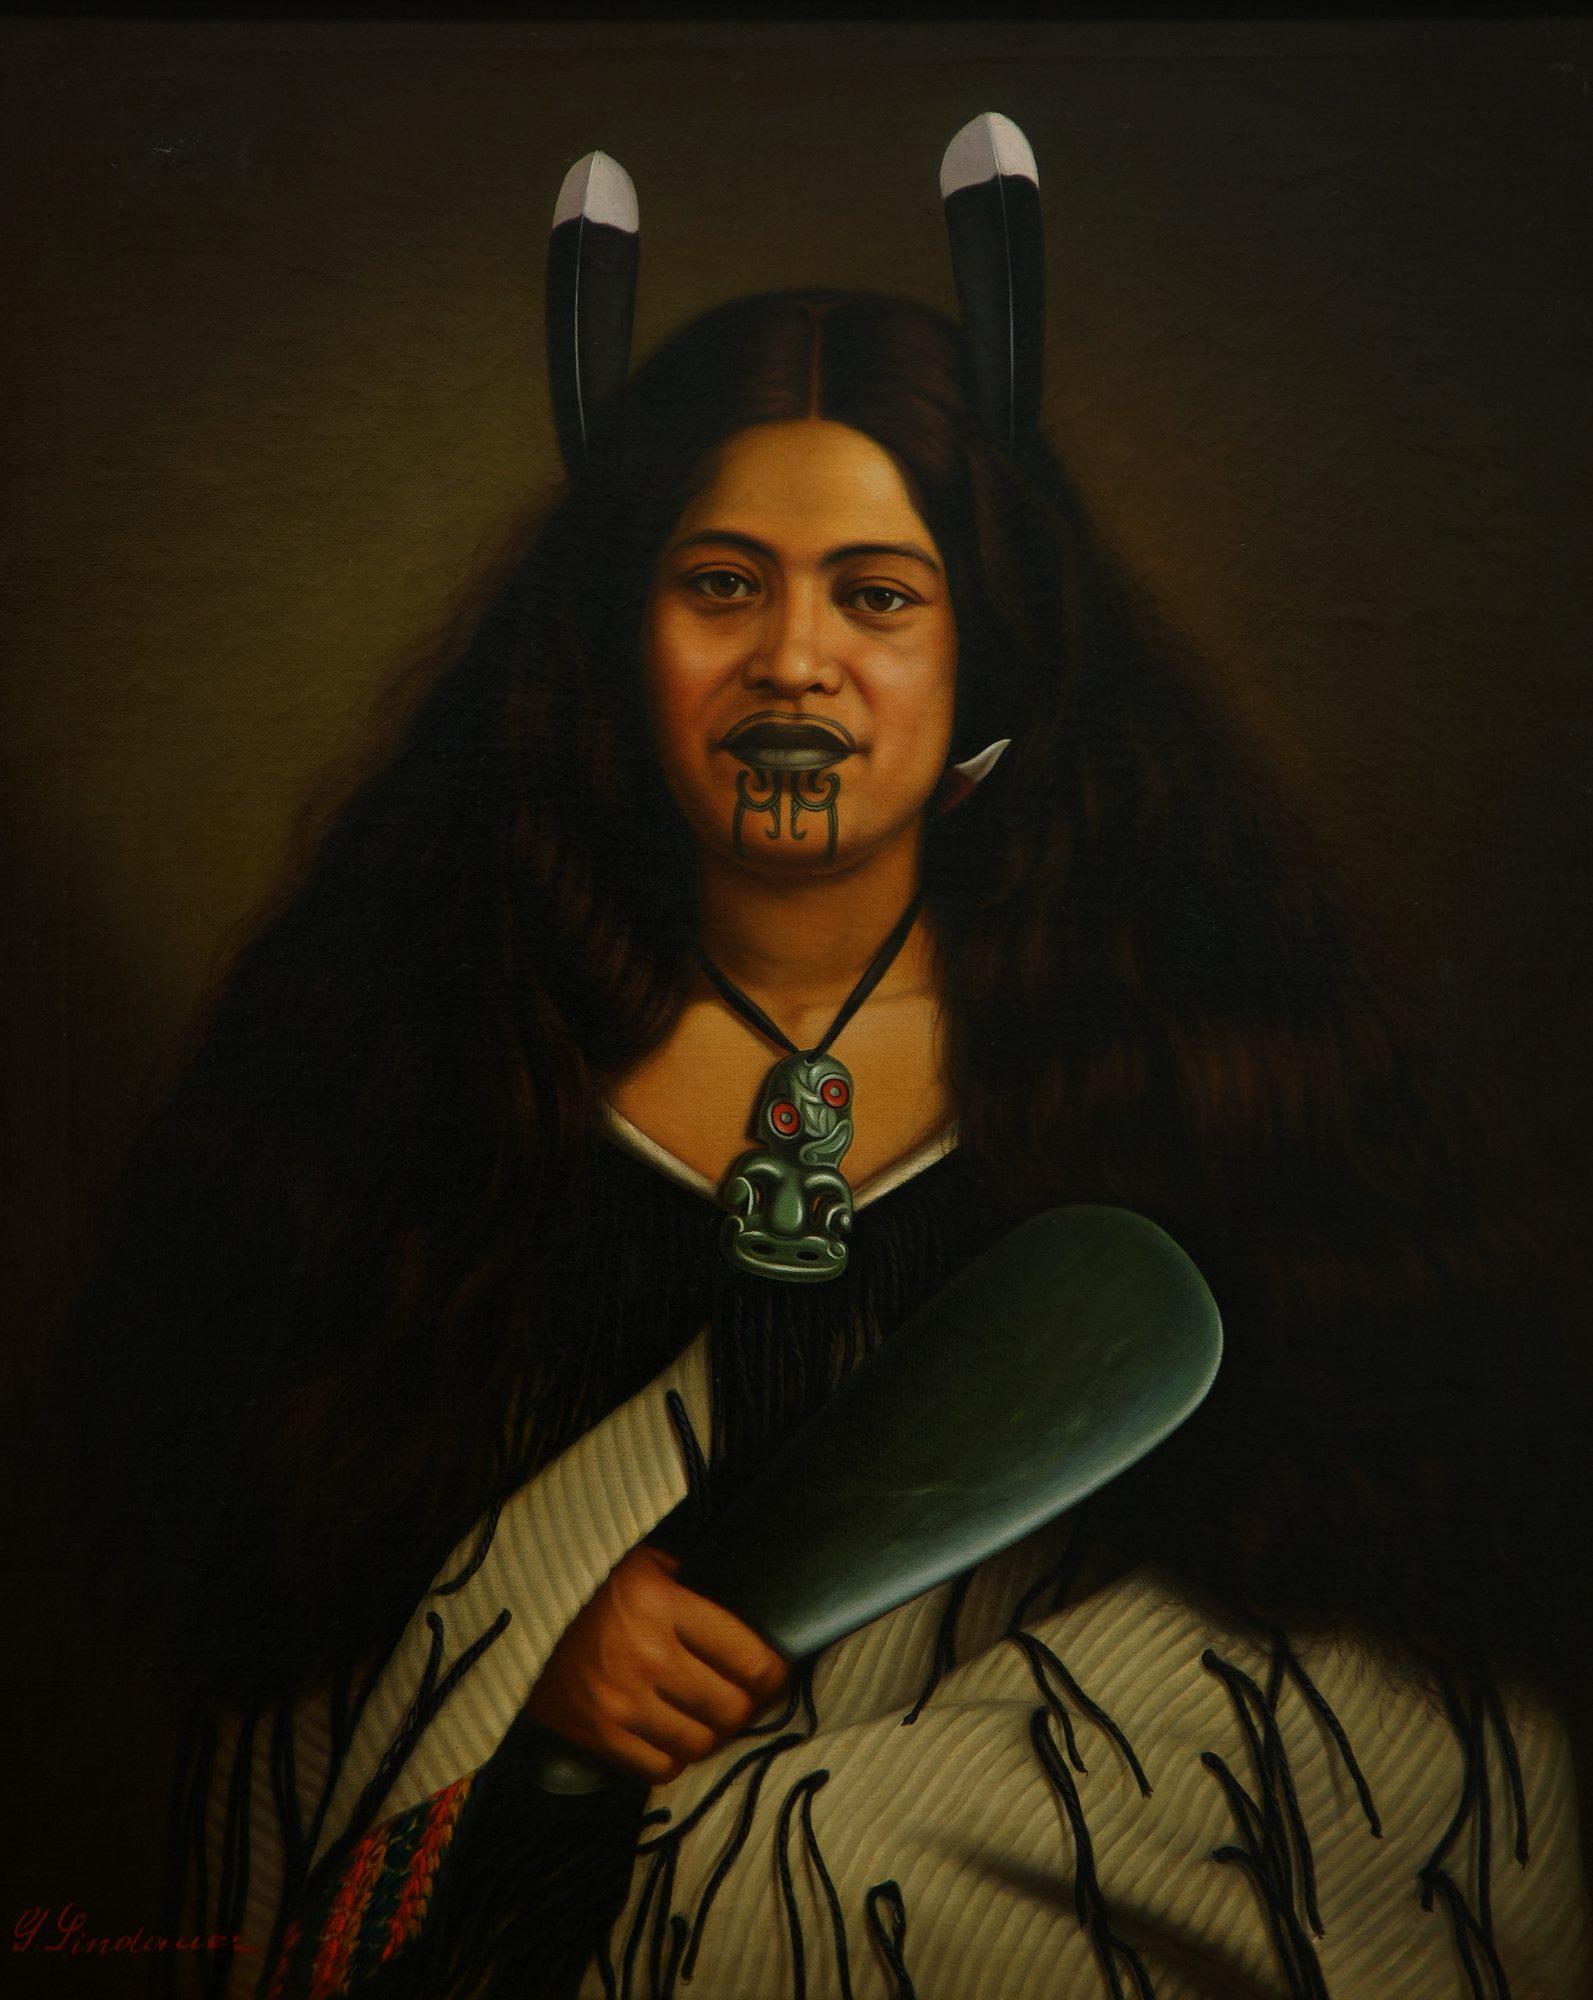 Gottfried Lindauer, 'Pare Watene,' 1878. Oil on canvas. Auckland Art Gallery Toi o Tāmaki